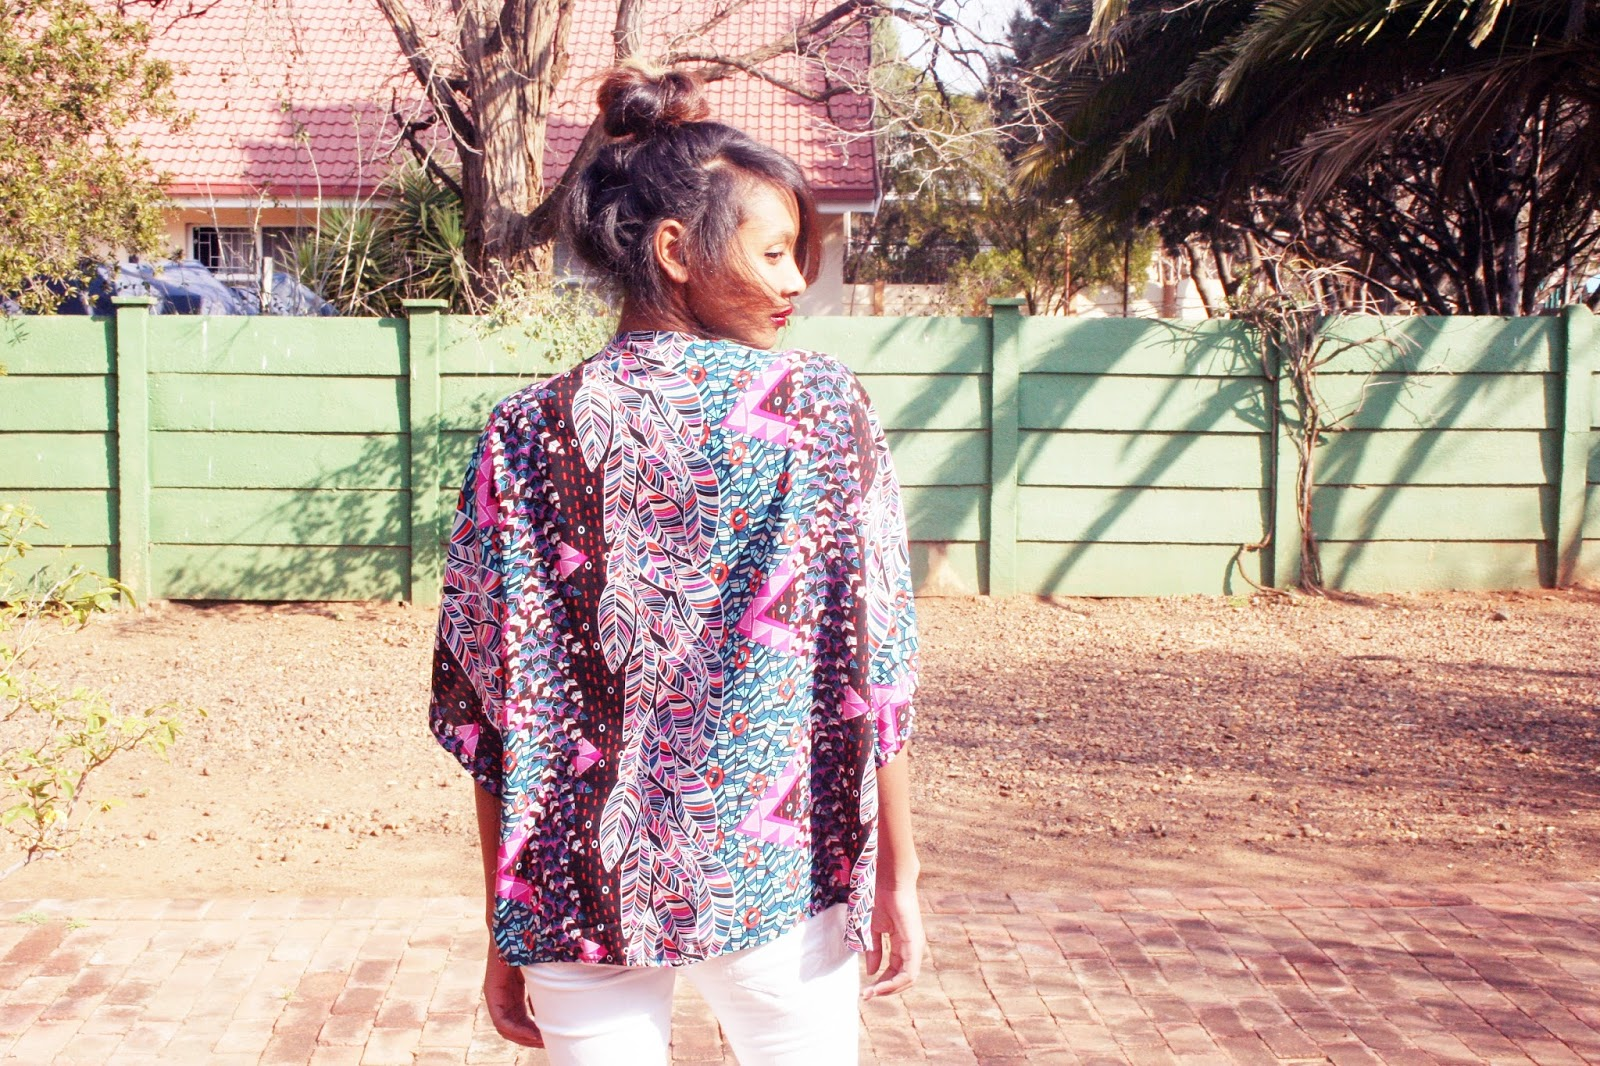 www.kalakelly.blogspot.com